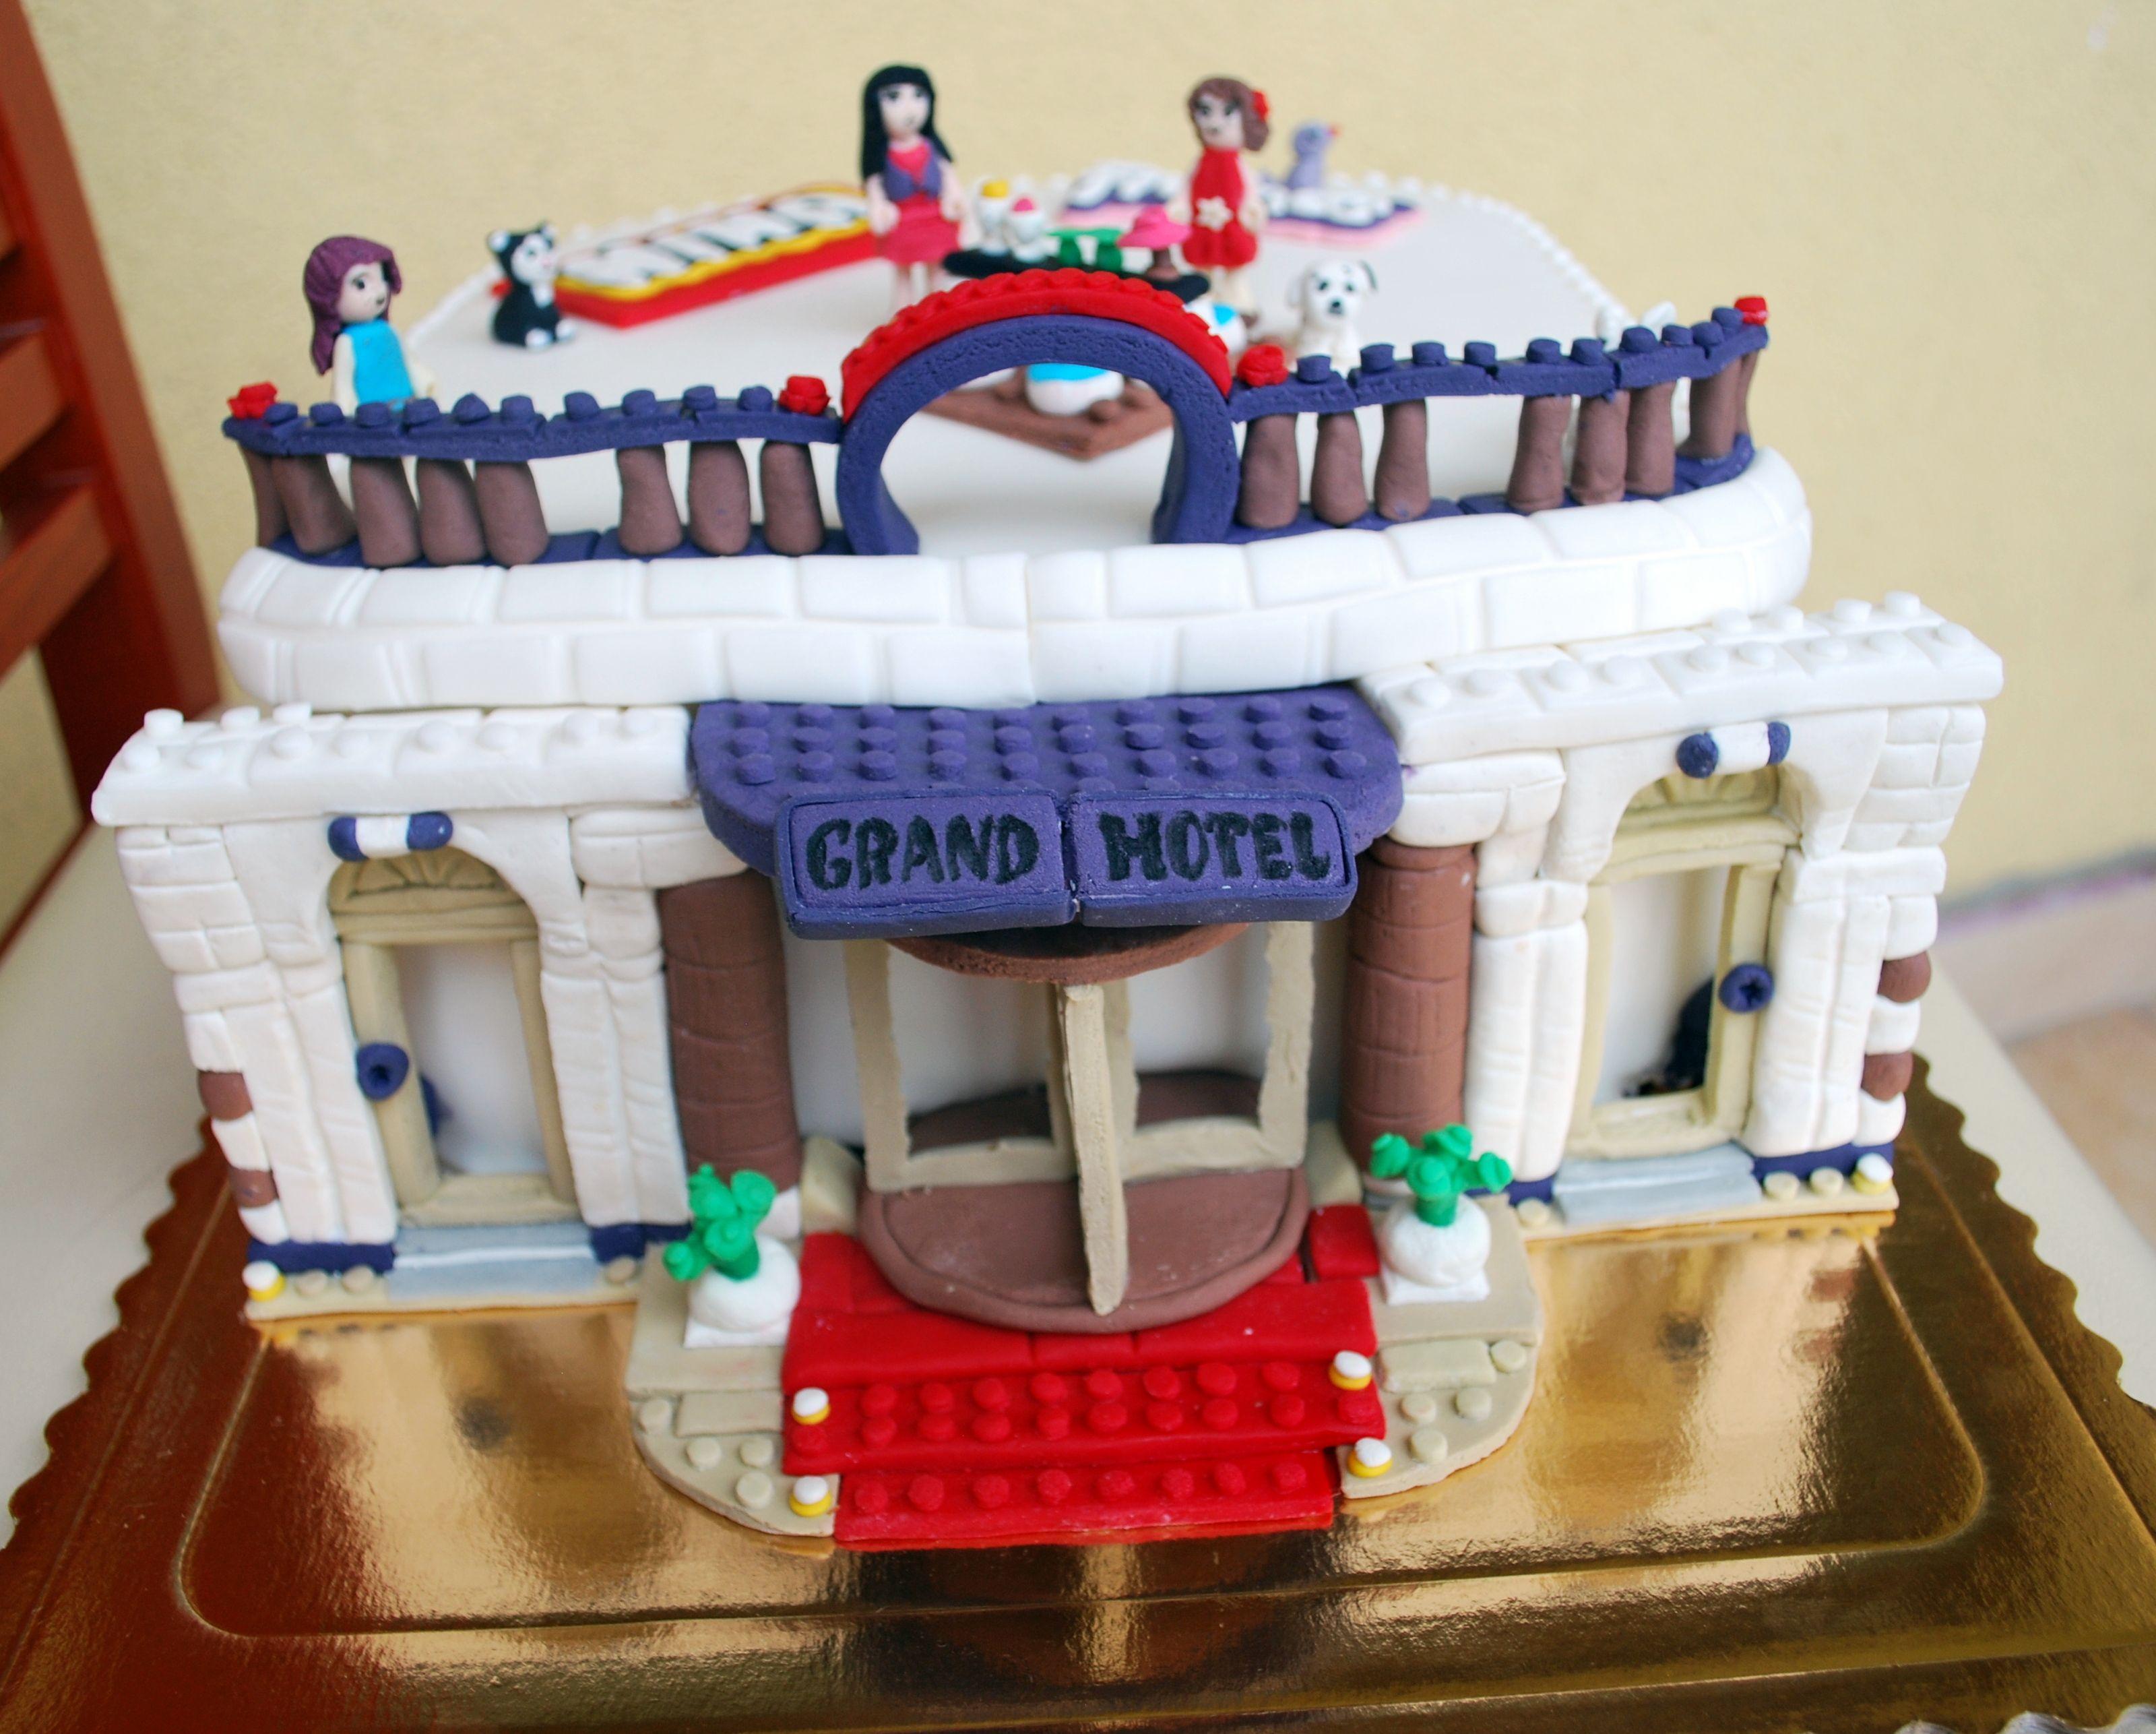 Lego friends heartlake grand hotel 41101 lego friends uk - Lego Friends Grand Hotel Fondant Cake For Ninka